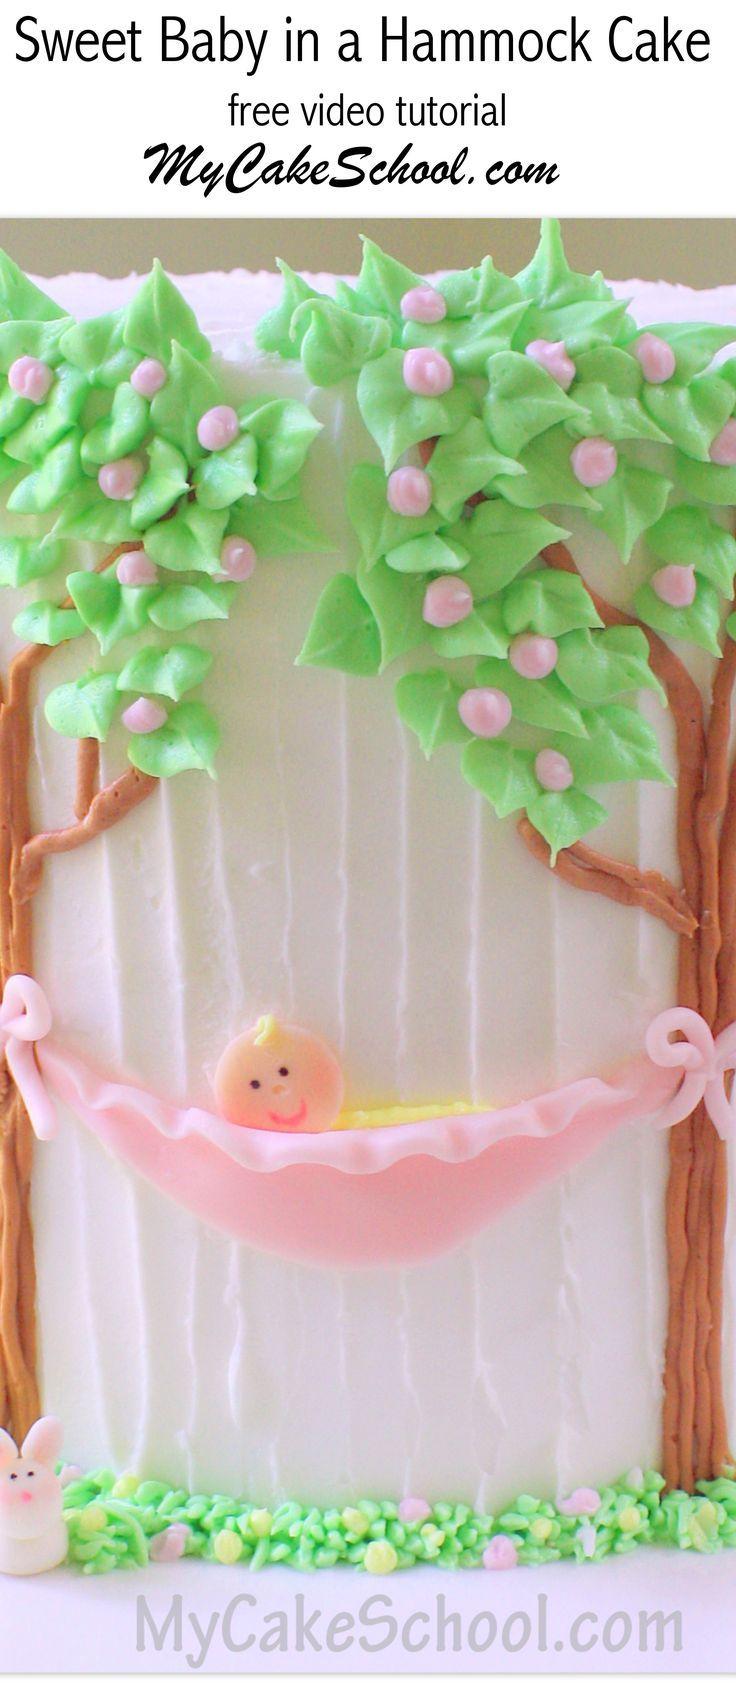 ADORABLE Baby in a Hammock Cake Design